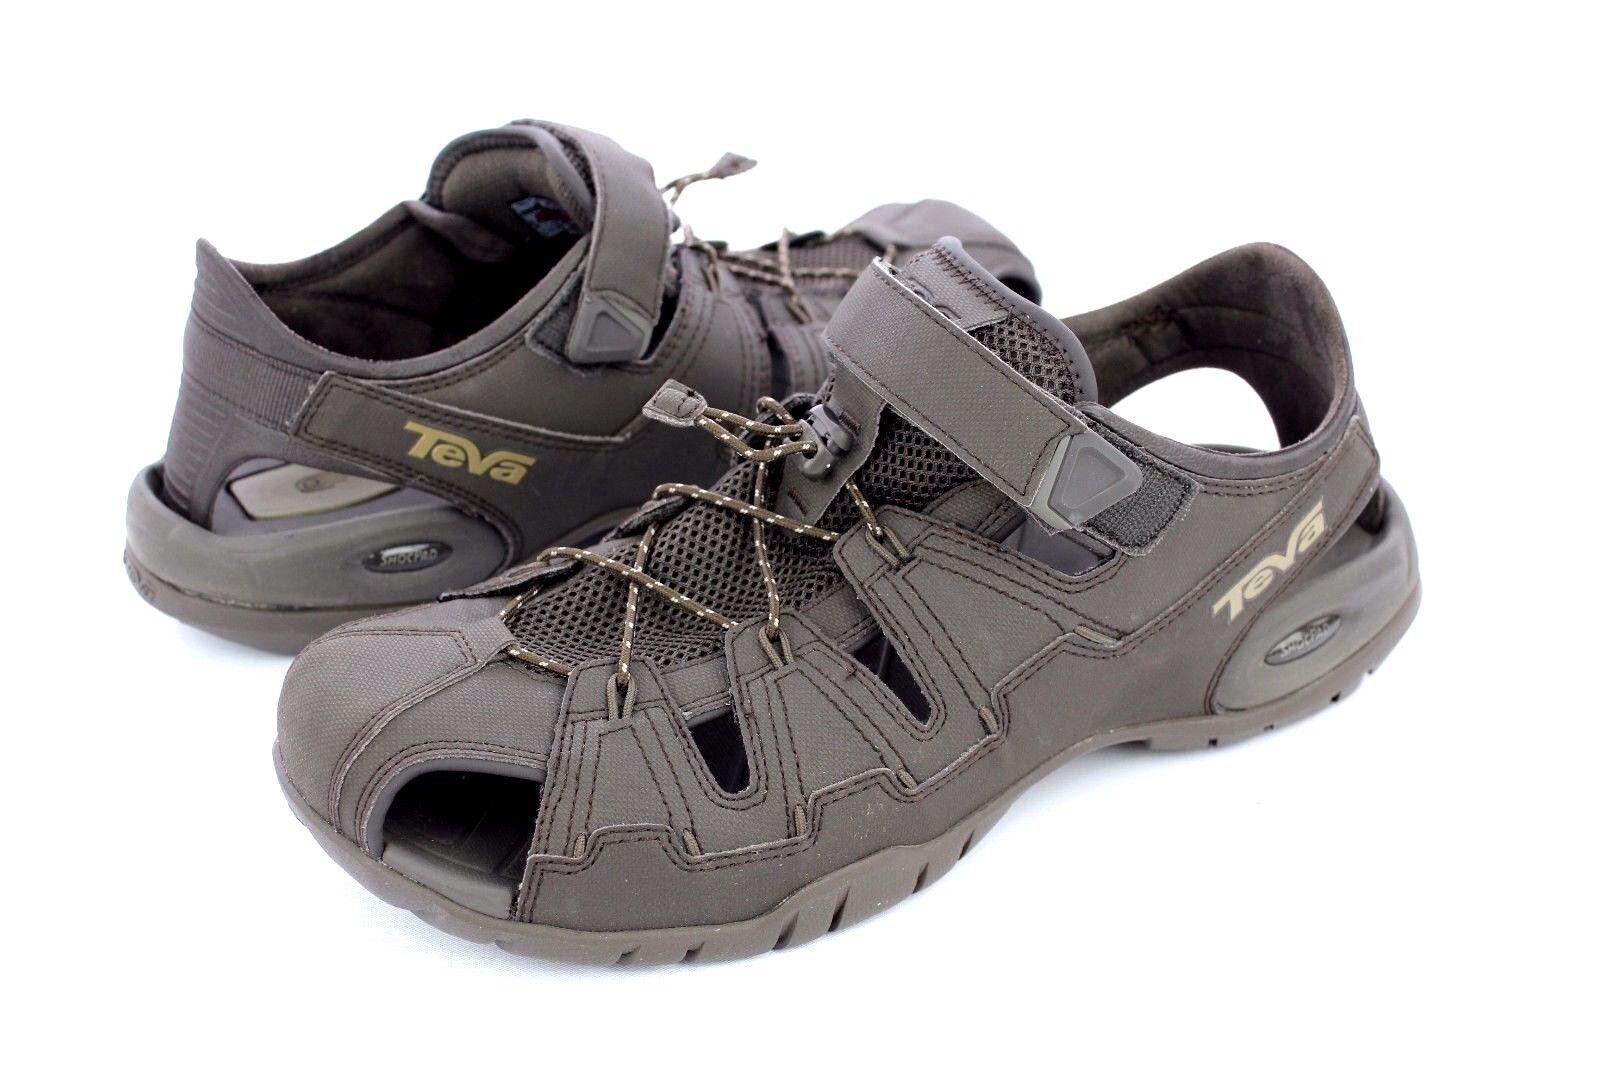 9f8ff4fb6 ... UPC 737045322094 product image for Teva Men s Dozer 4 Sandal 1006248 - Black  Olive - 10 ...